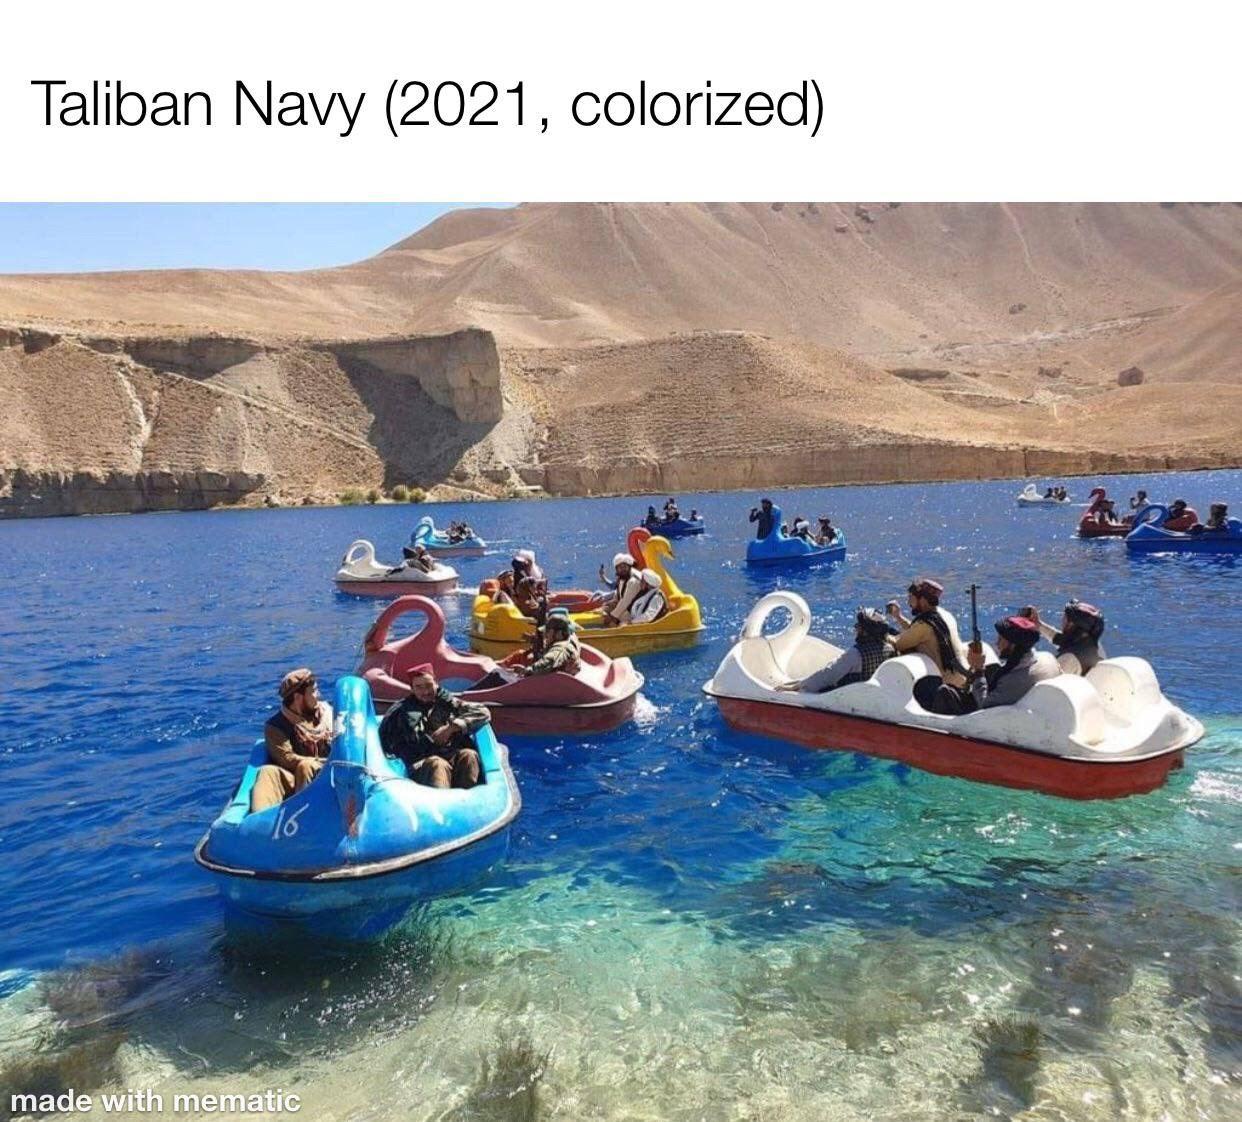 Sailing on the Seven Seas